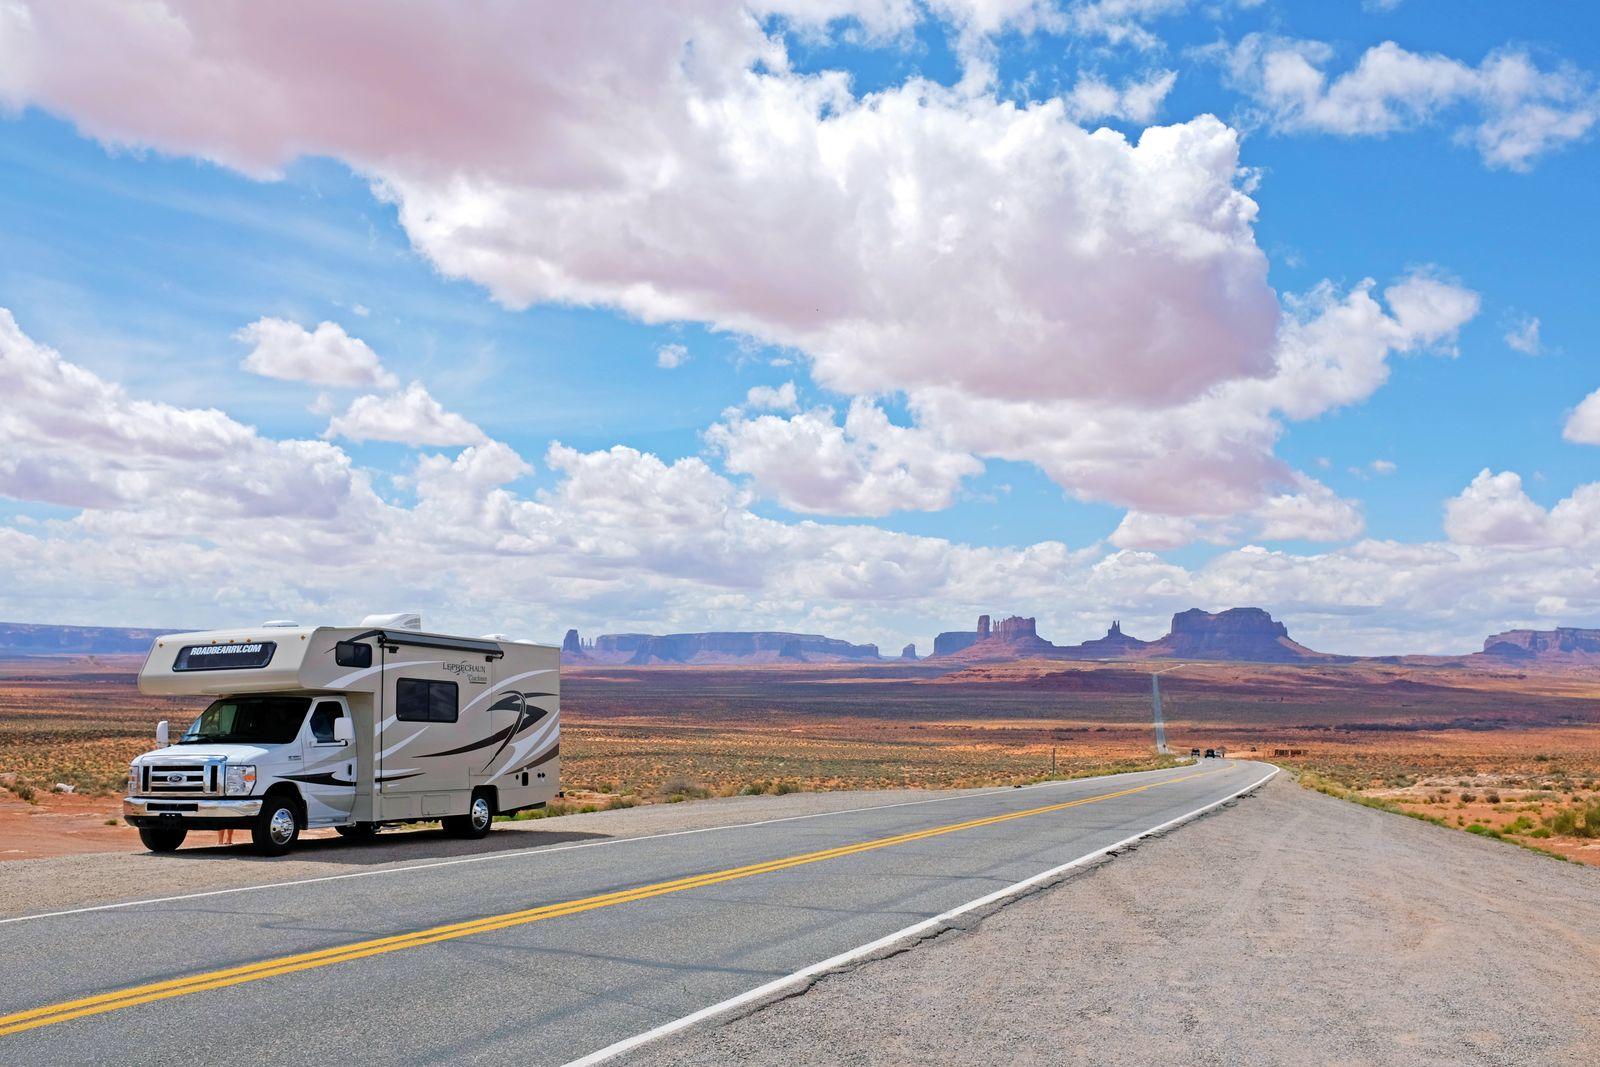 Wohnmobil im Monument Valley